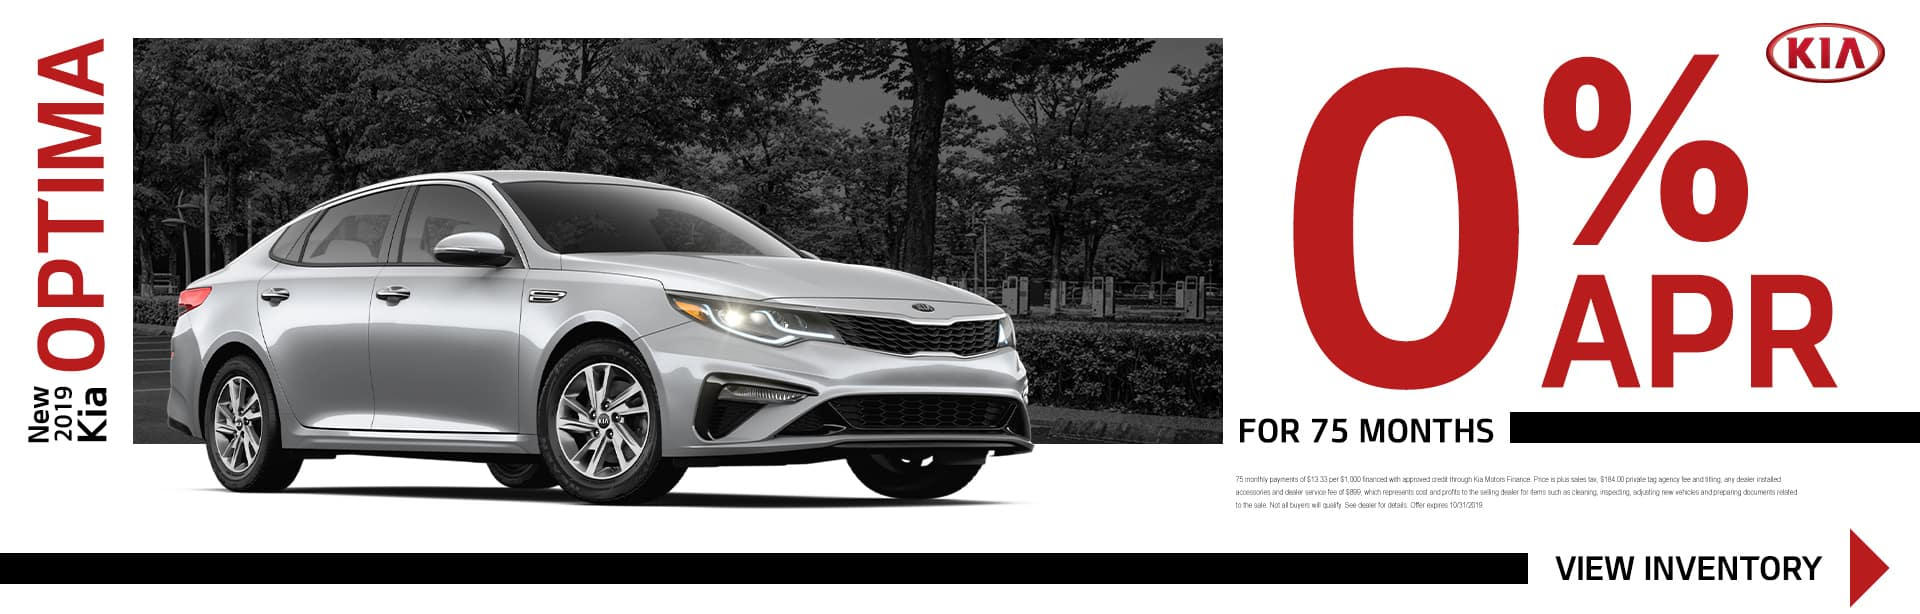 New 2019 Kia Optima | 0% APR For 75 Months